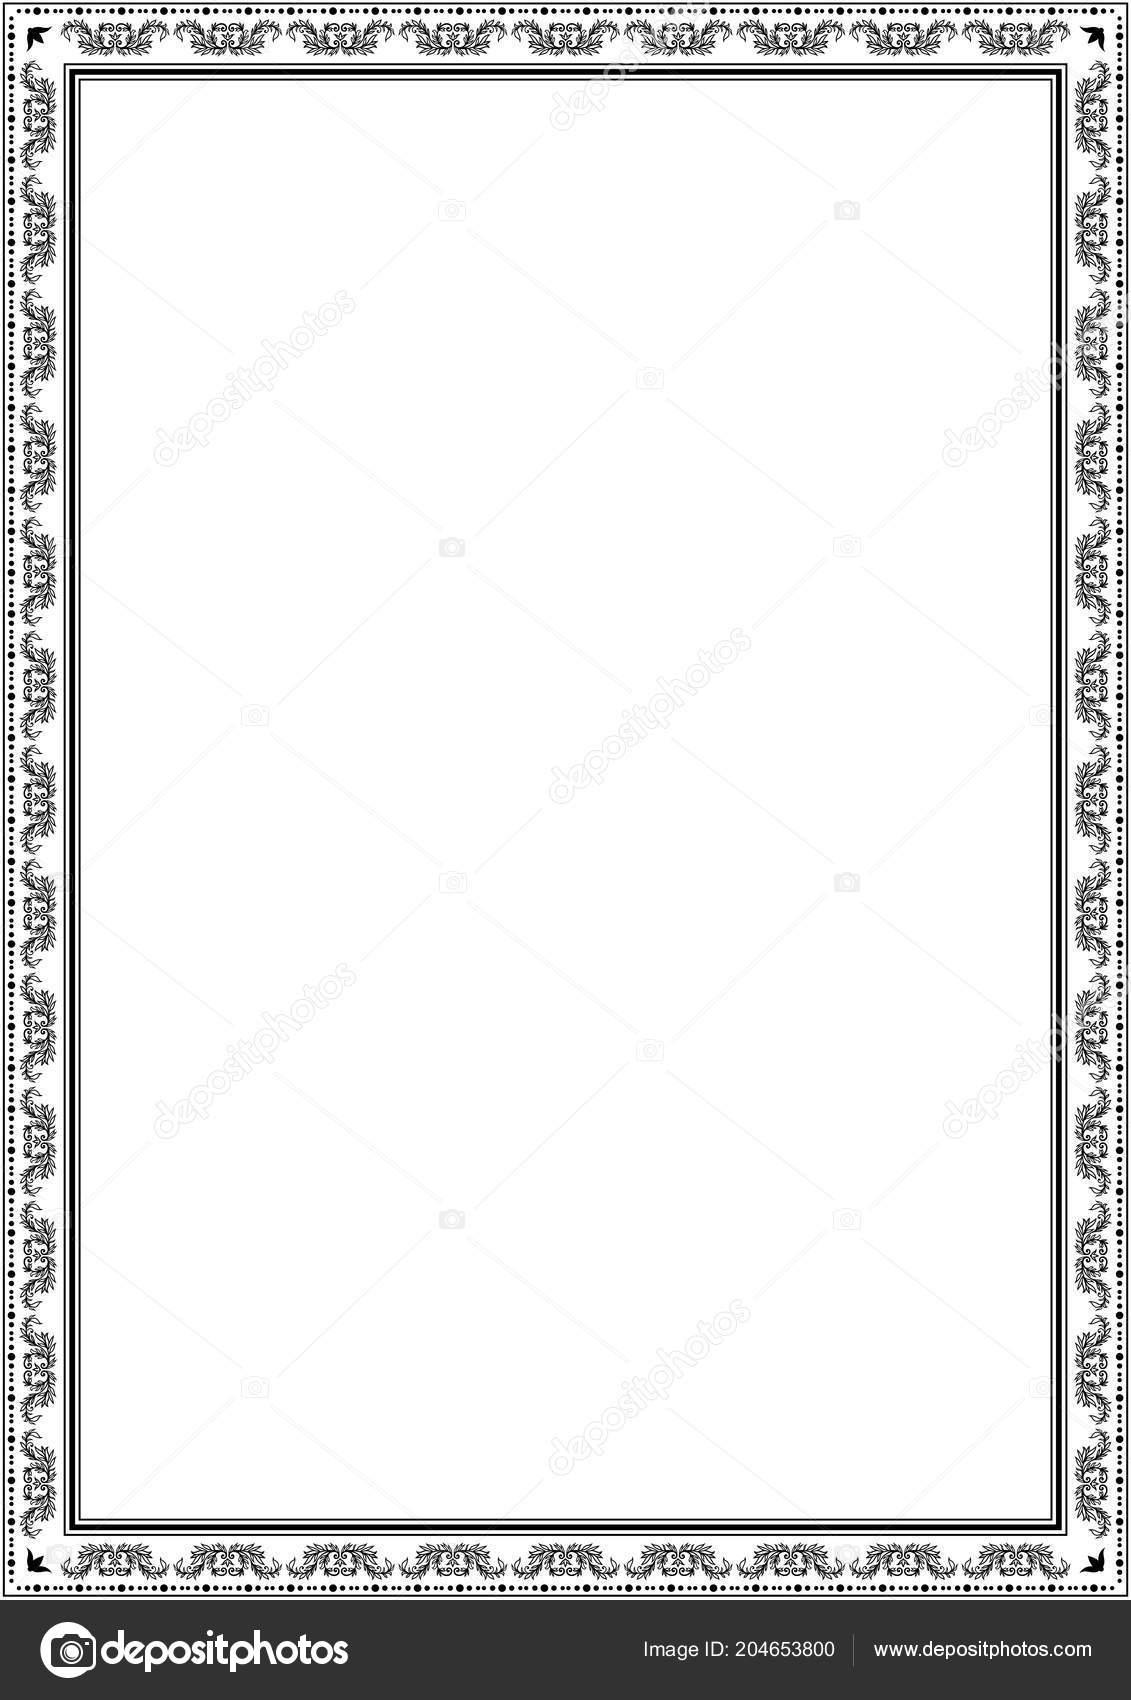 Frame Border Design Template Black White Decorative Vector Image By C Shiny777 Stock 204653800